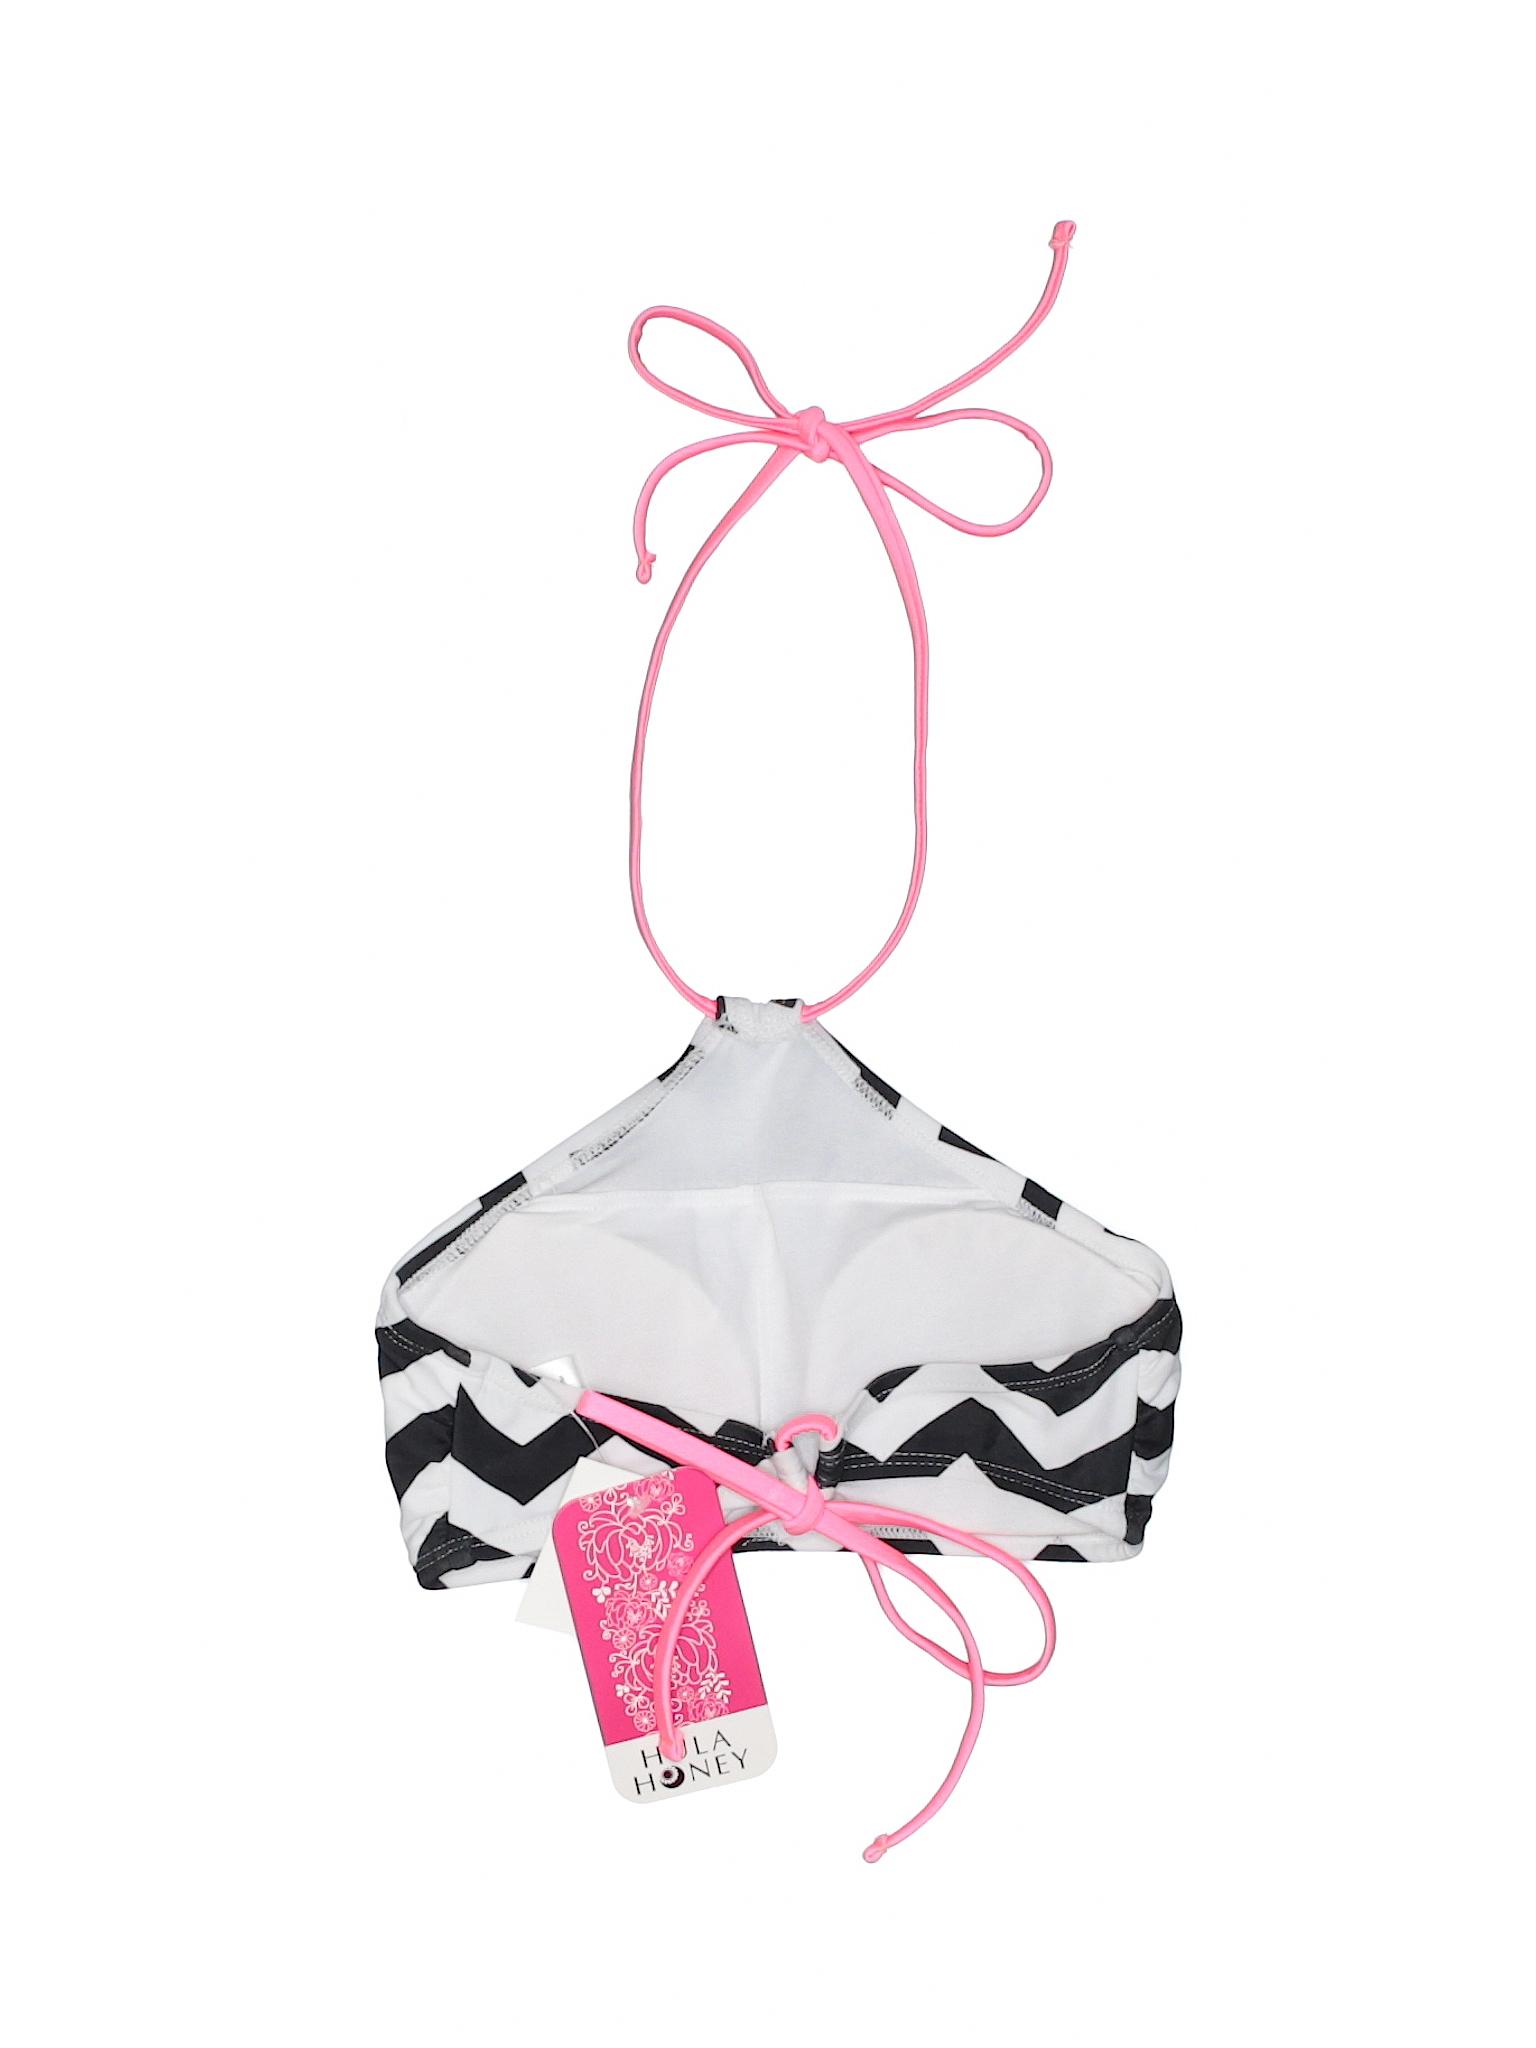 Boutique Hula Boutique Swimsuit Honey Hula Top 5zERwx1q